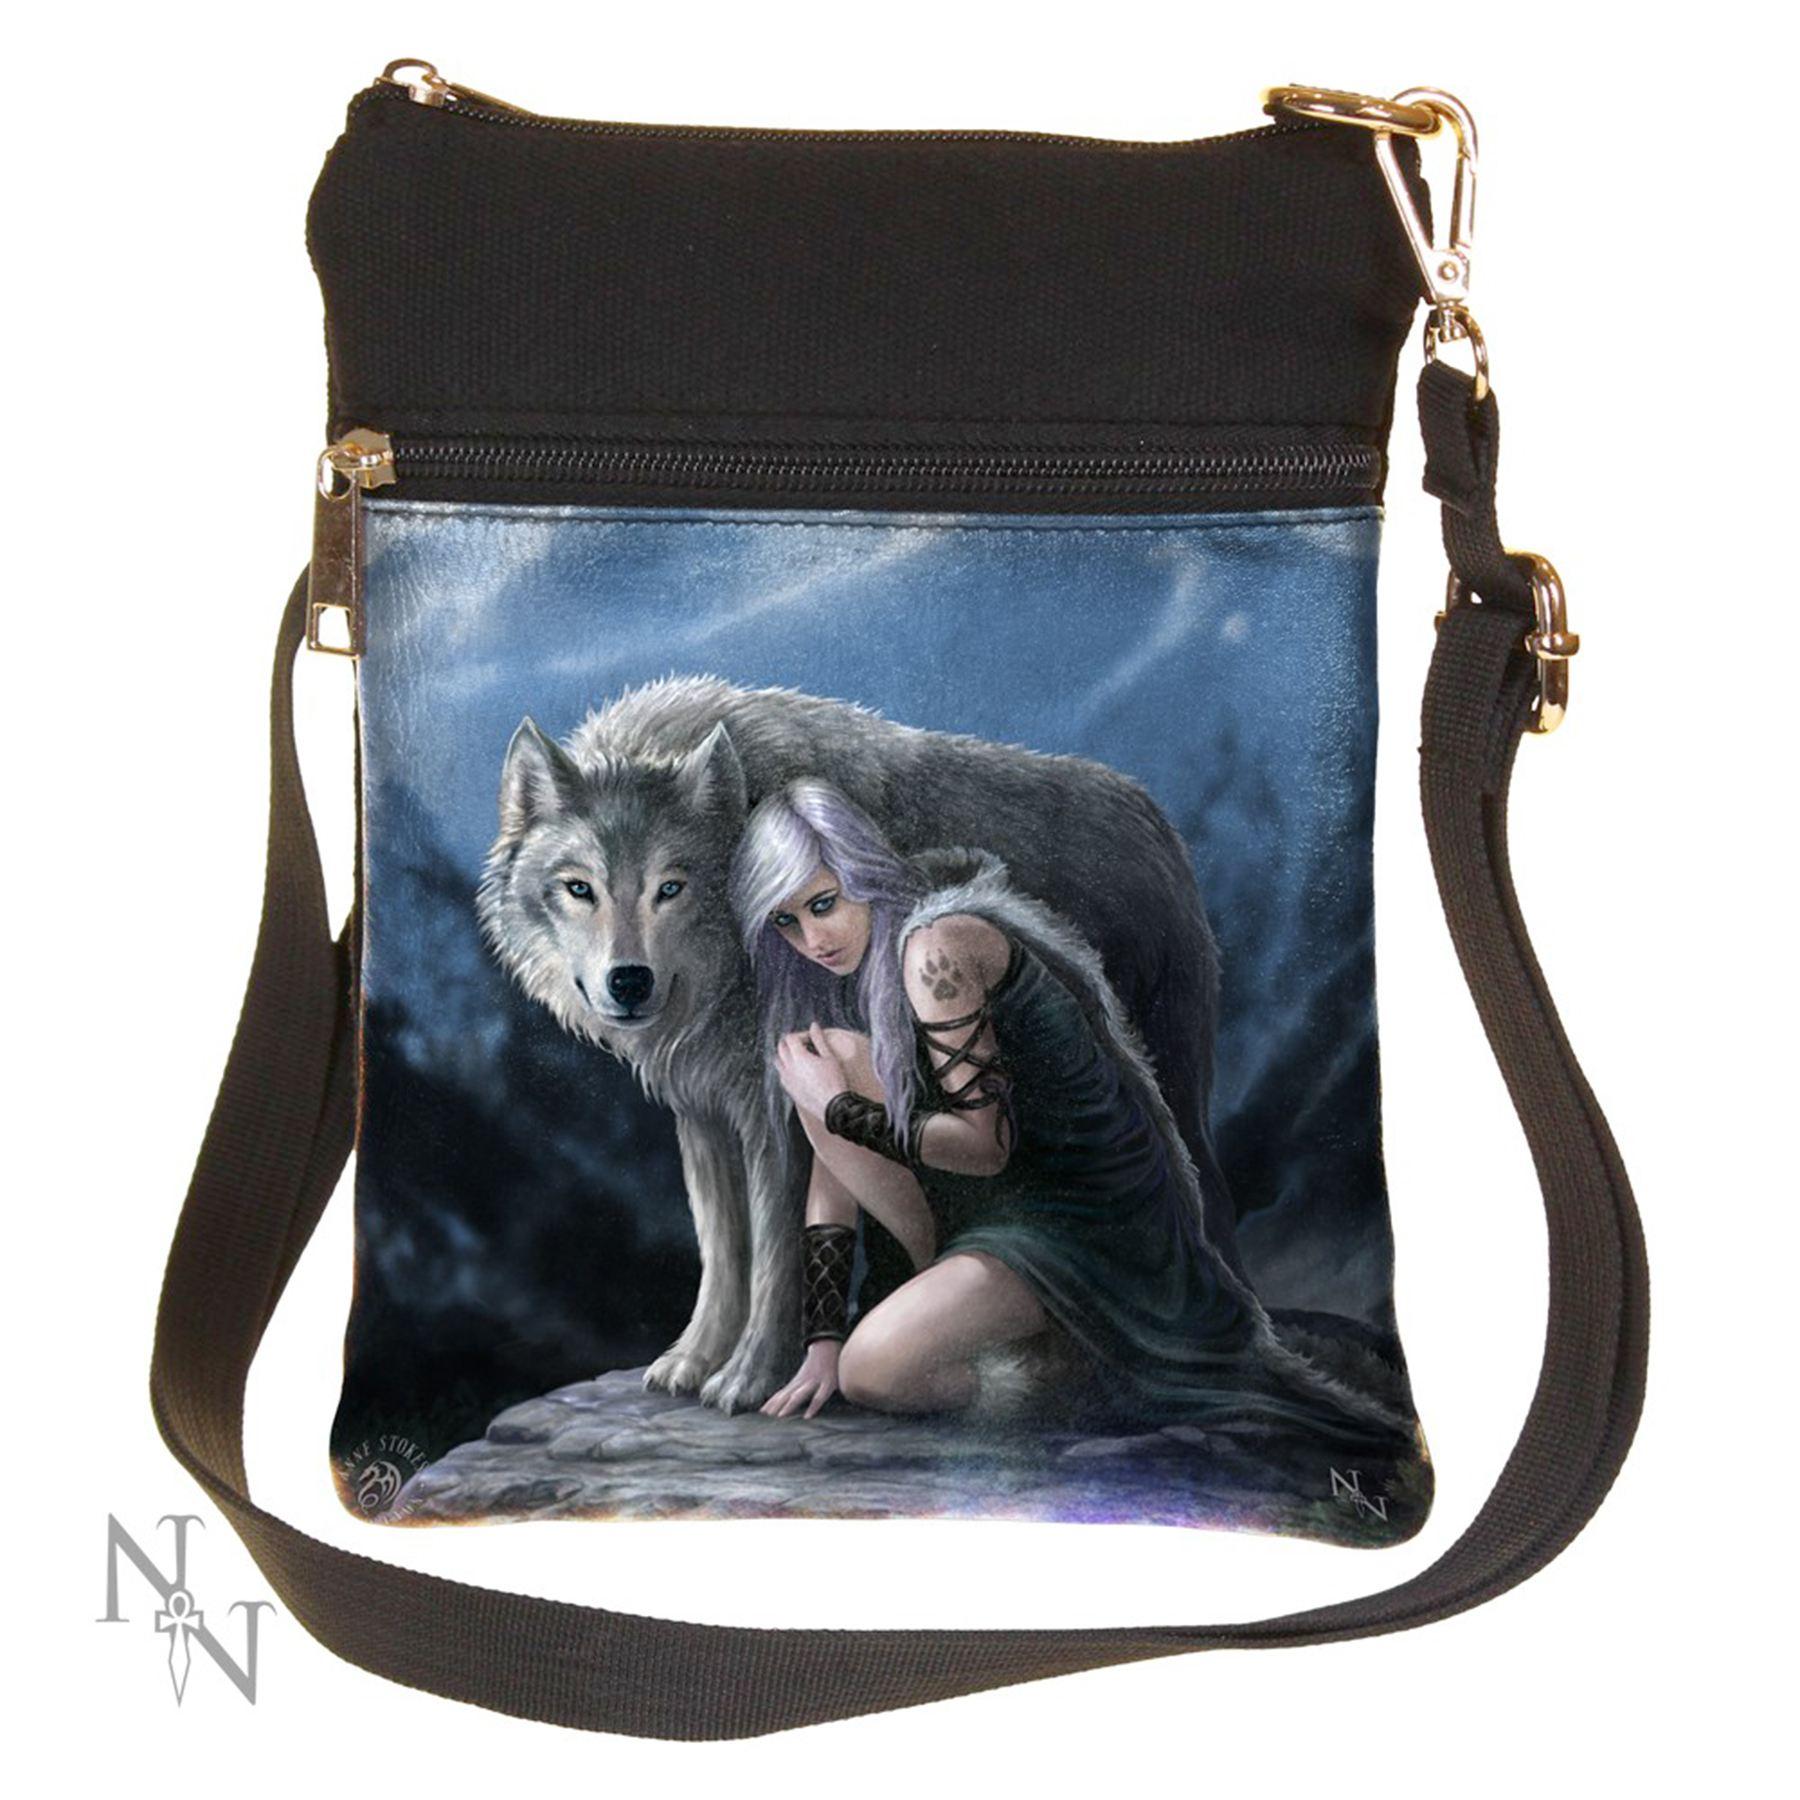 Nemesis Now Shoulder Bag 23cm High Wolf Tablet School Bag Handbag Gothic Fantasy